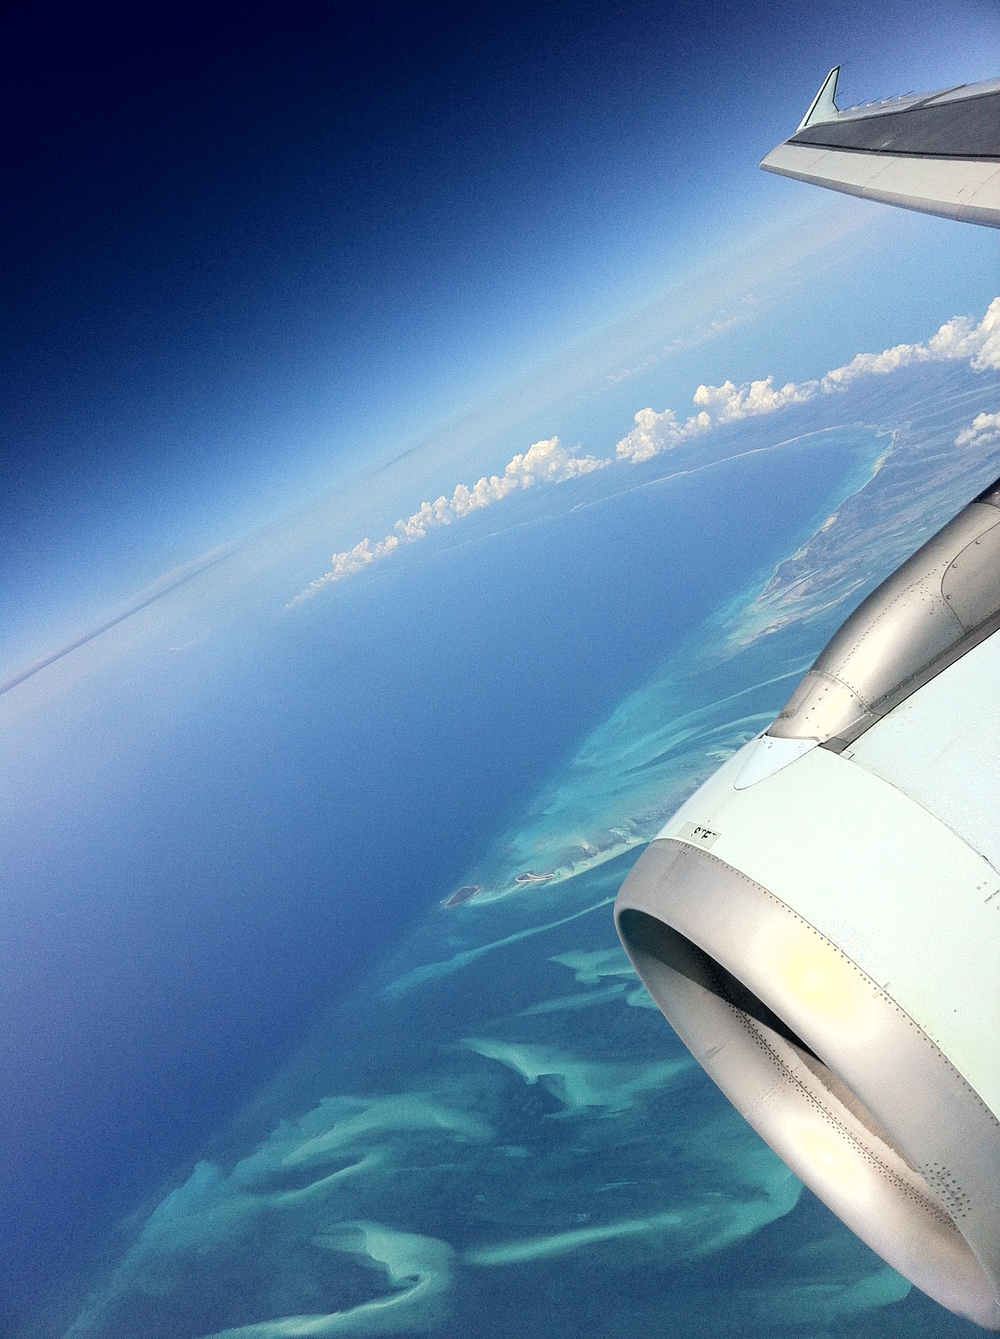 bahama-ngai003.jpg